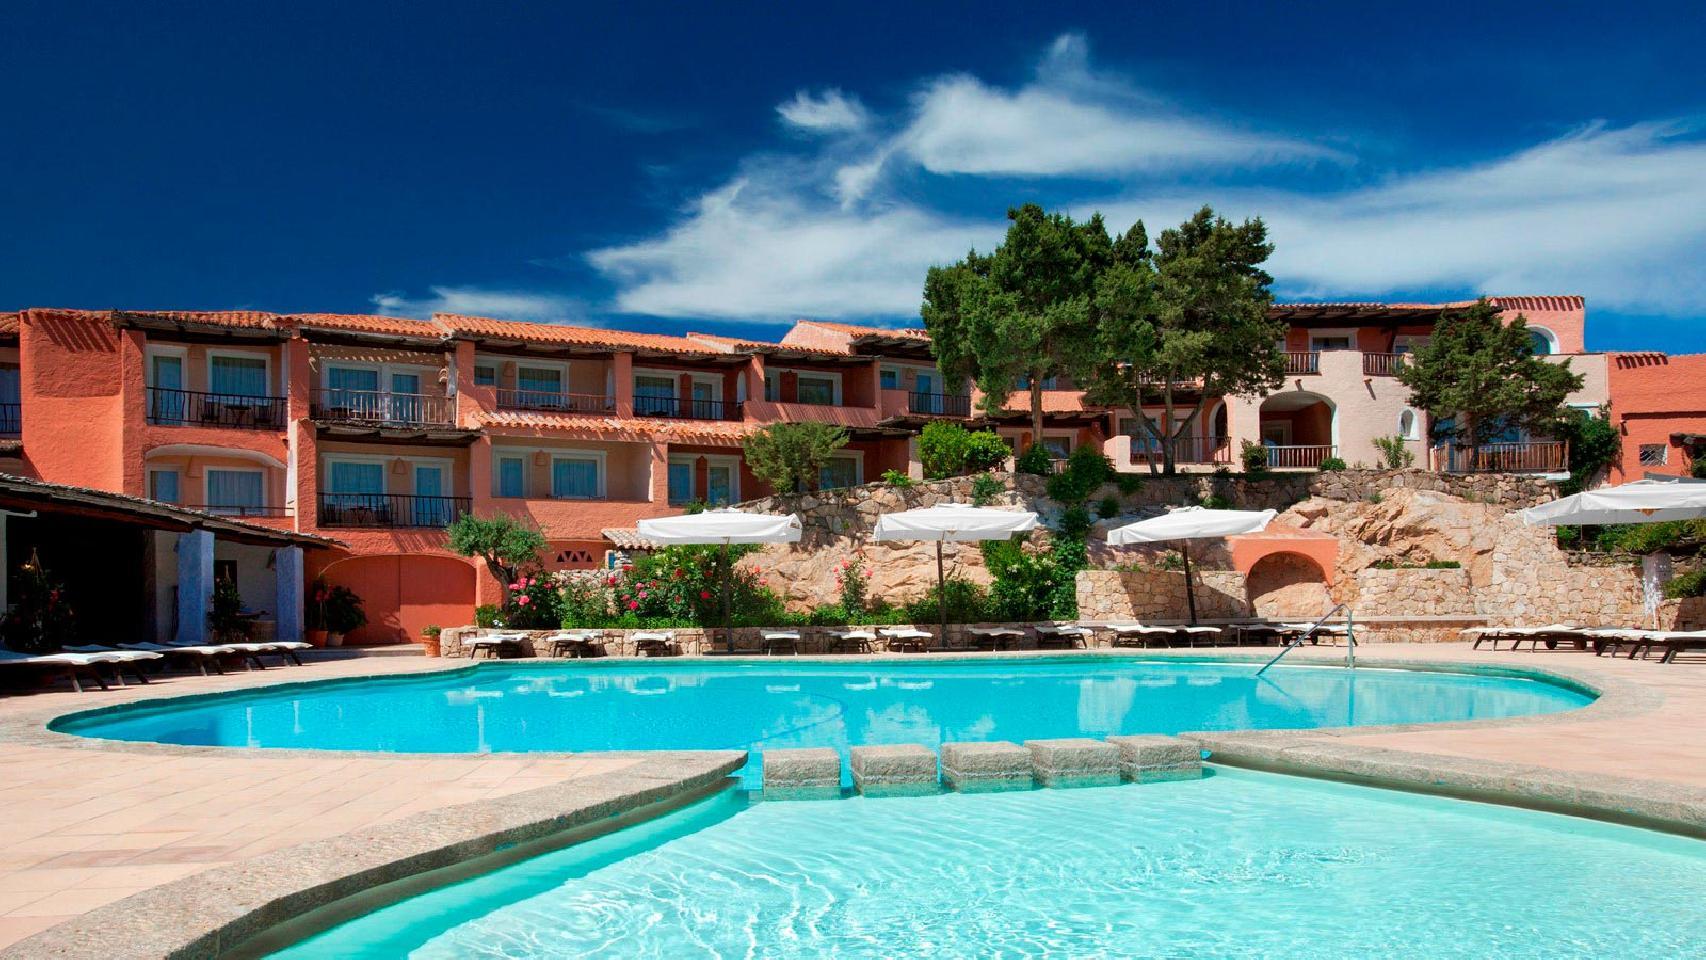 Cervo hotel costa smeralda resort porto cervo for Villaggio li cuncheddi sardegna